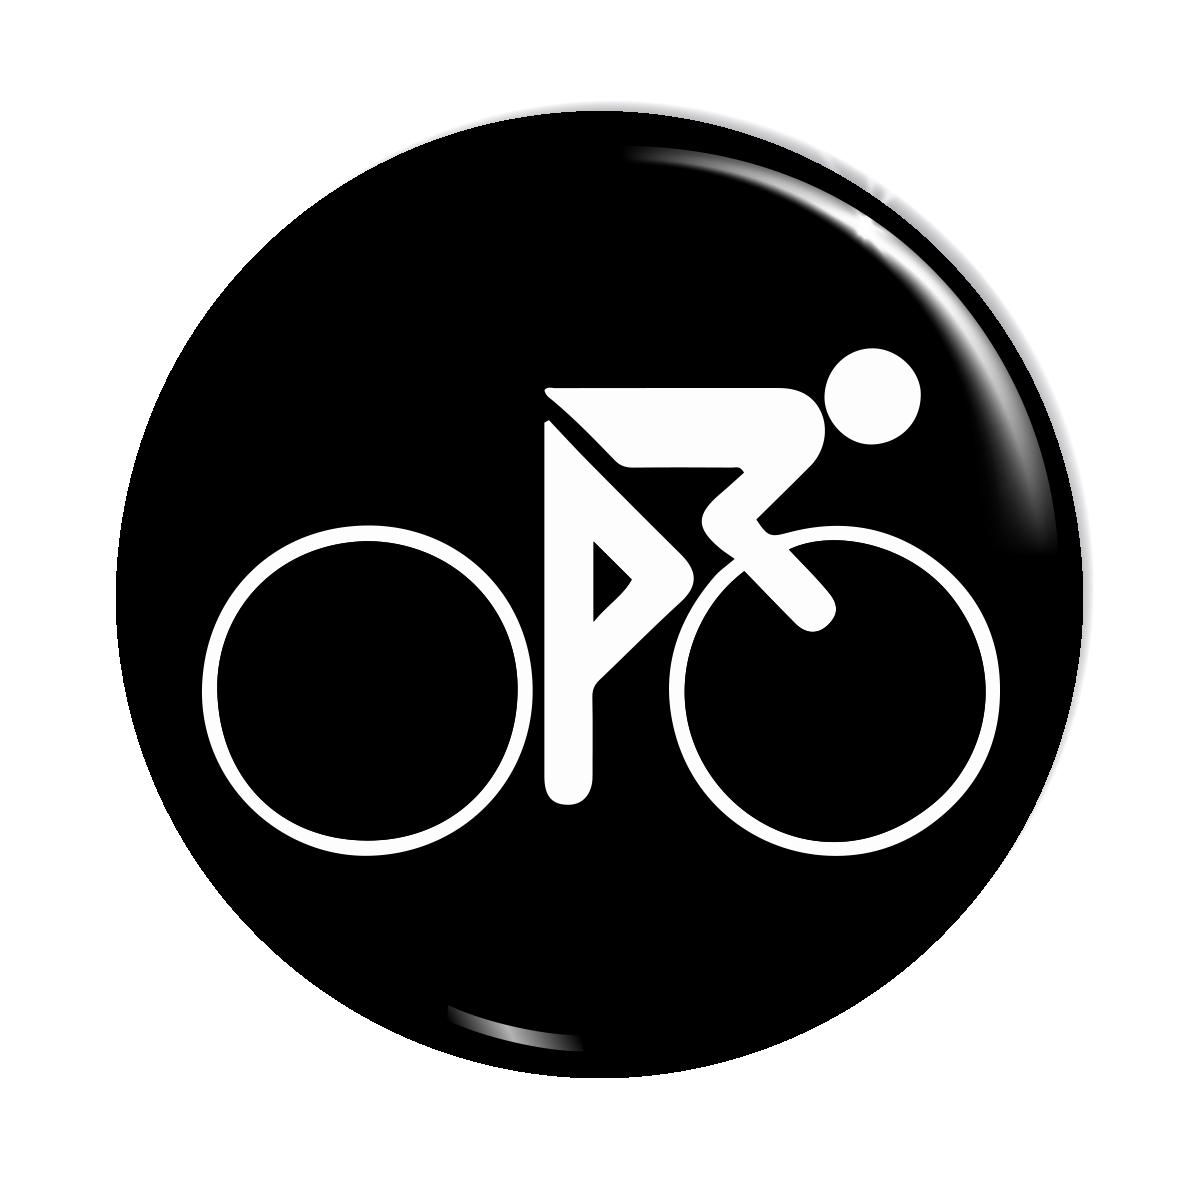 پیکسل آسانا طرح ورزش دوچرخه سواری کد ASA180